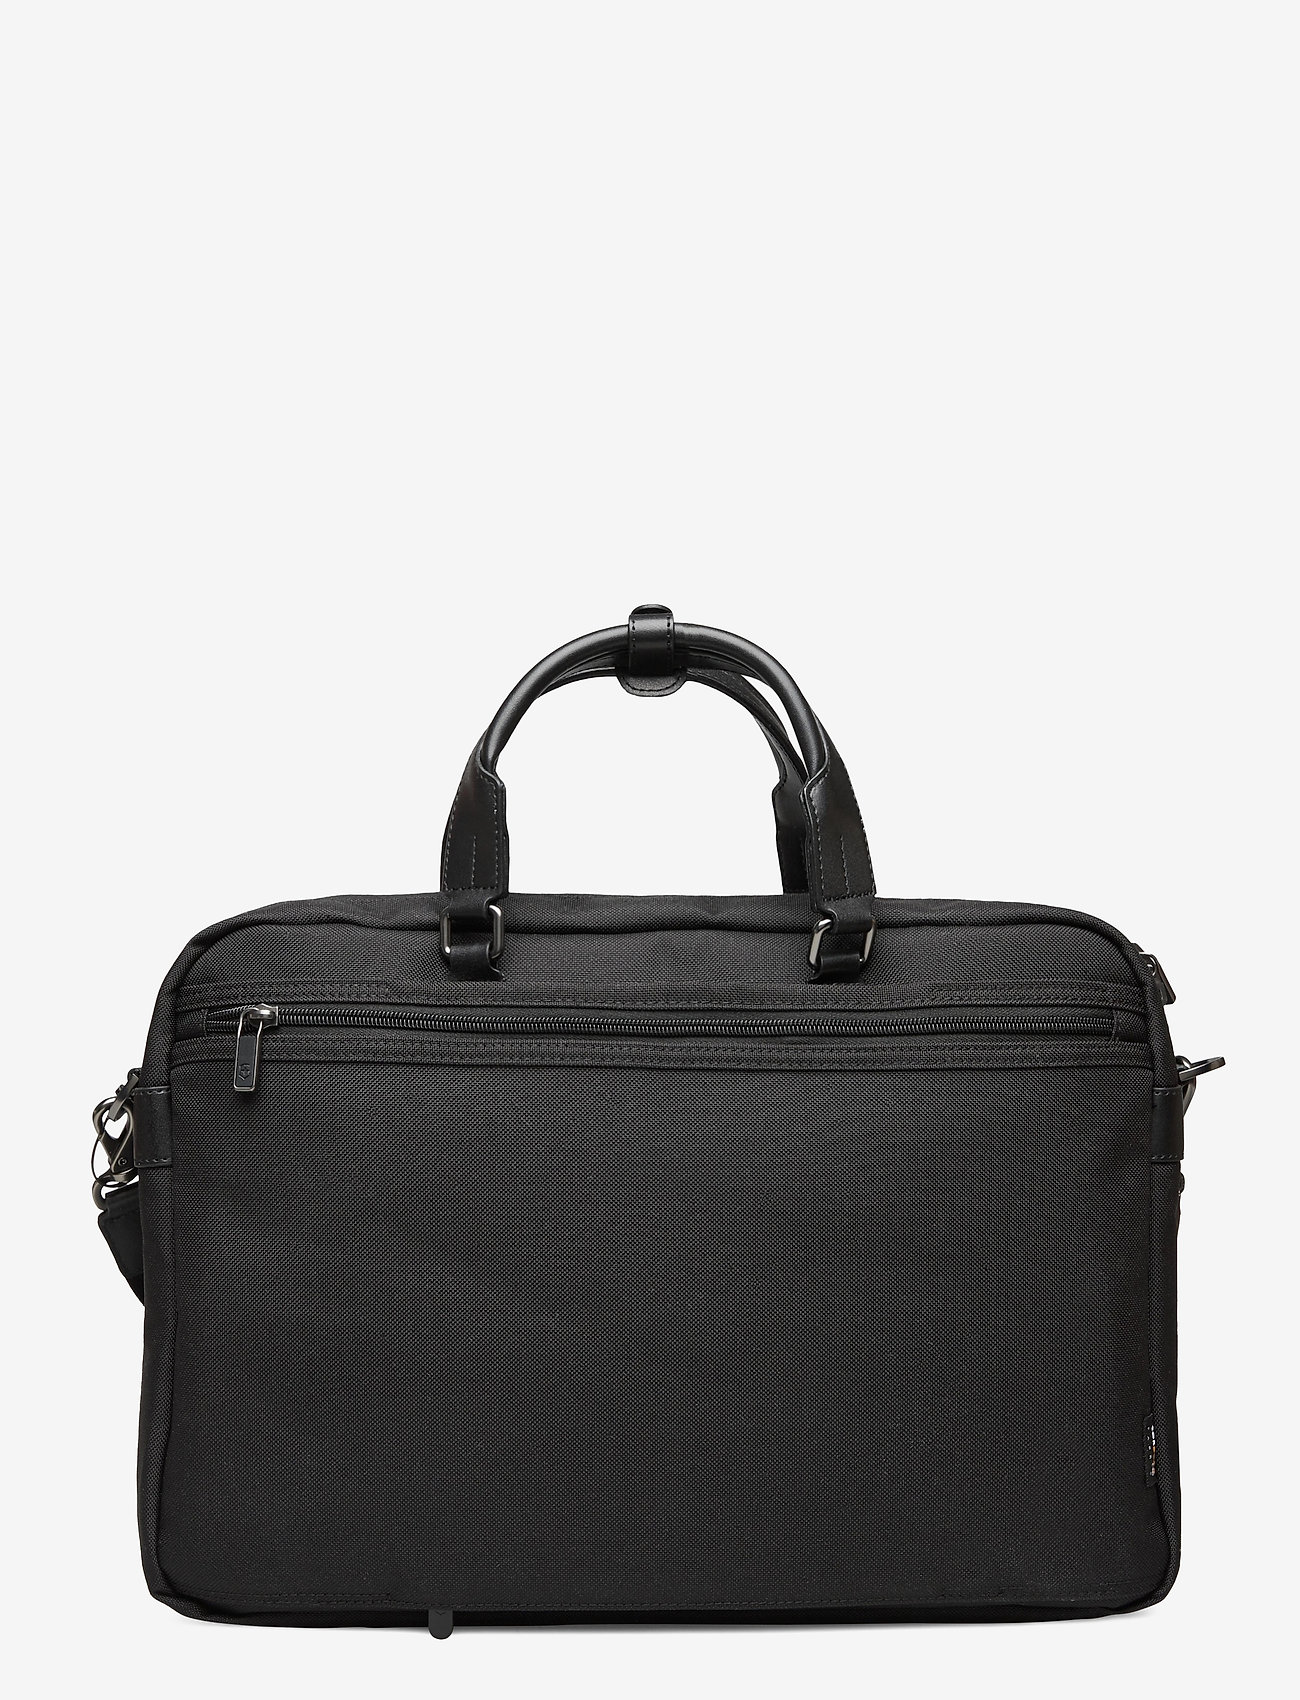 "Victorinox - Werks Professional Cordura, 15"" Laptop Brief - black - 1"